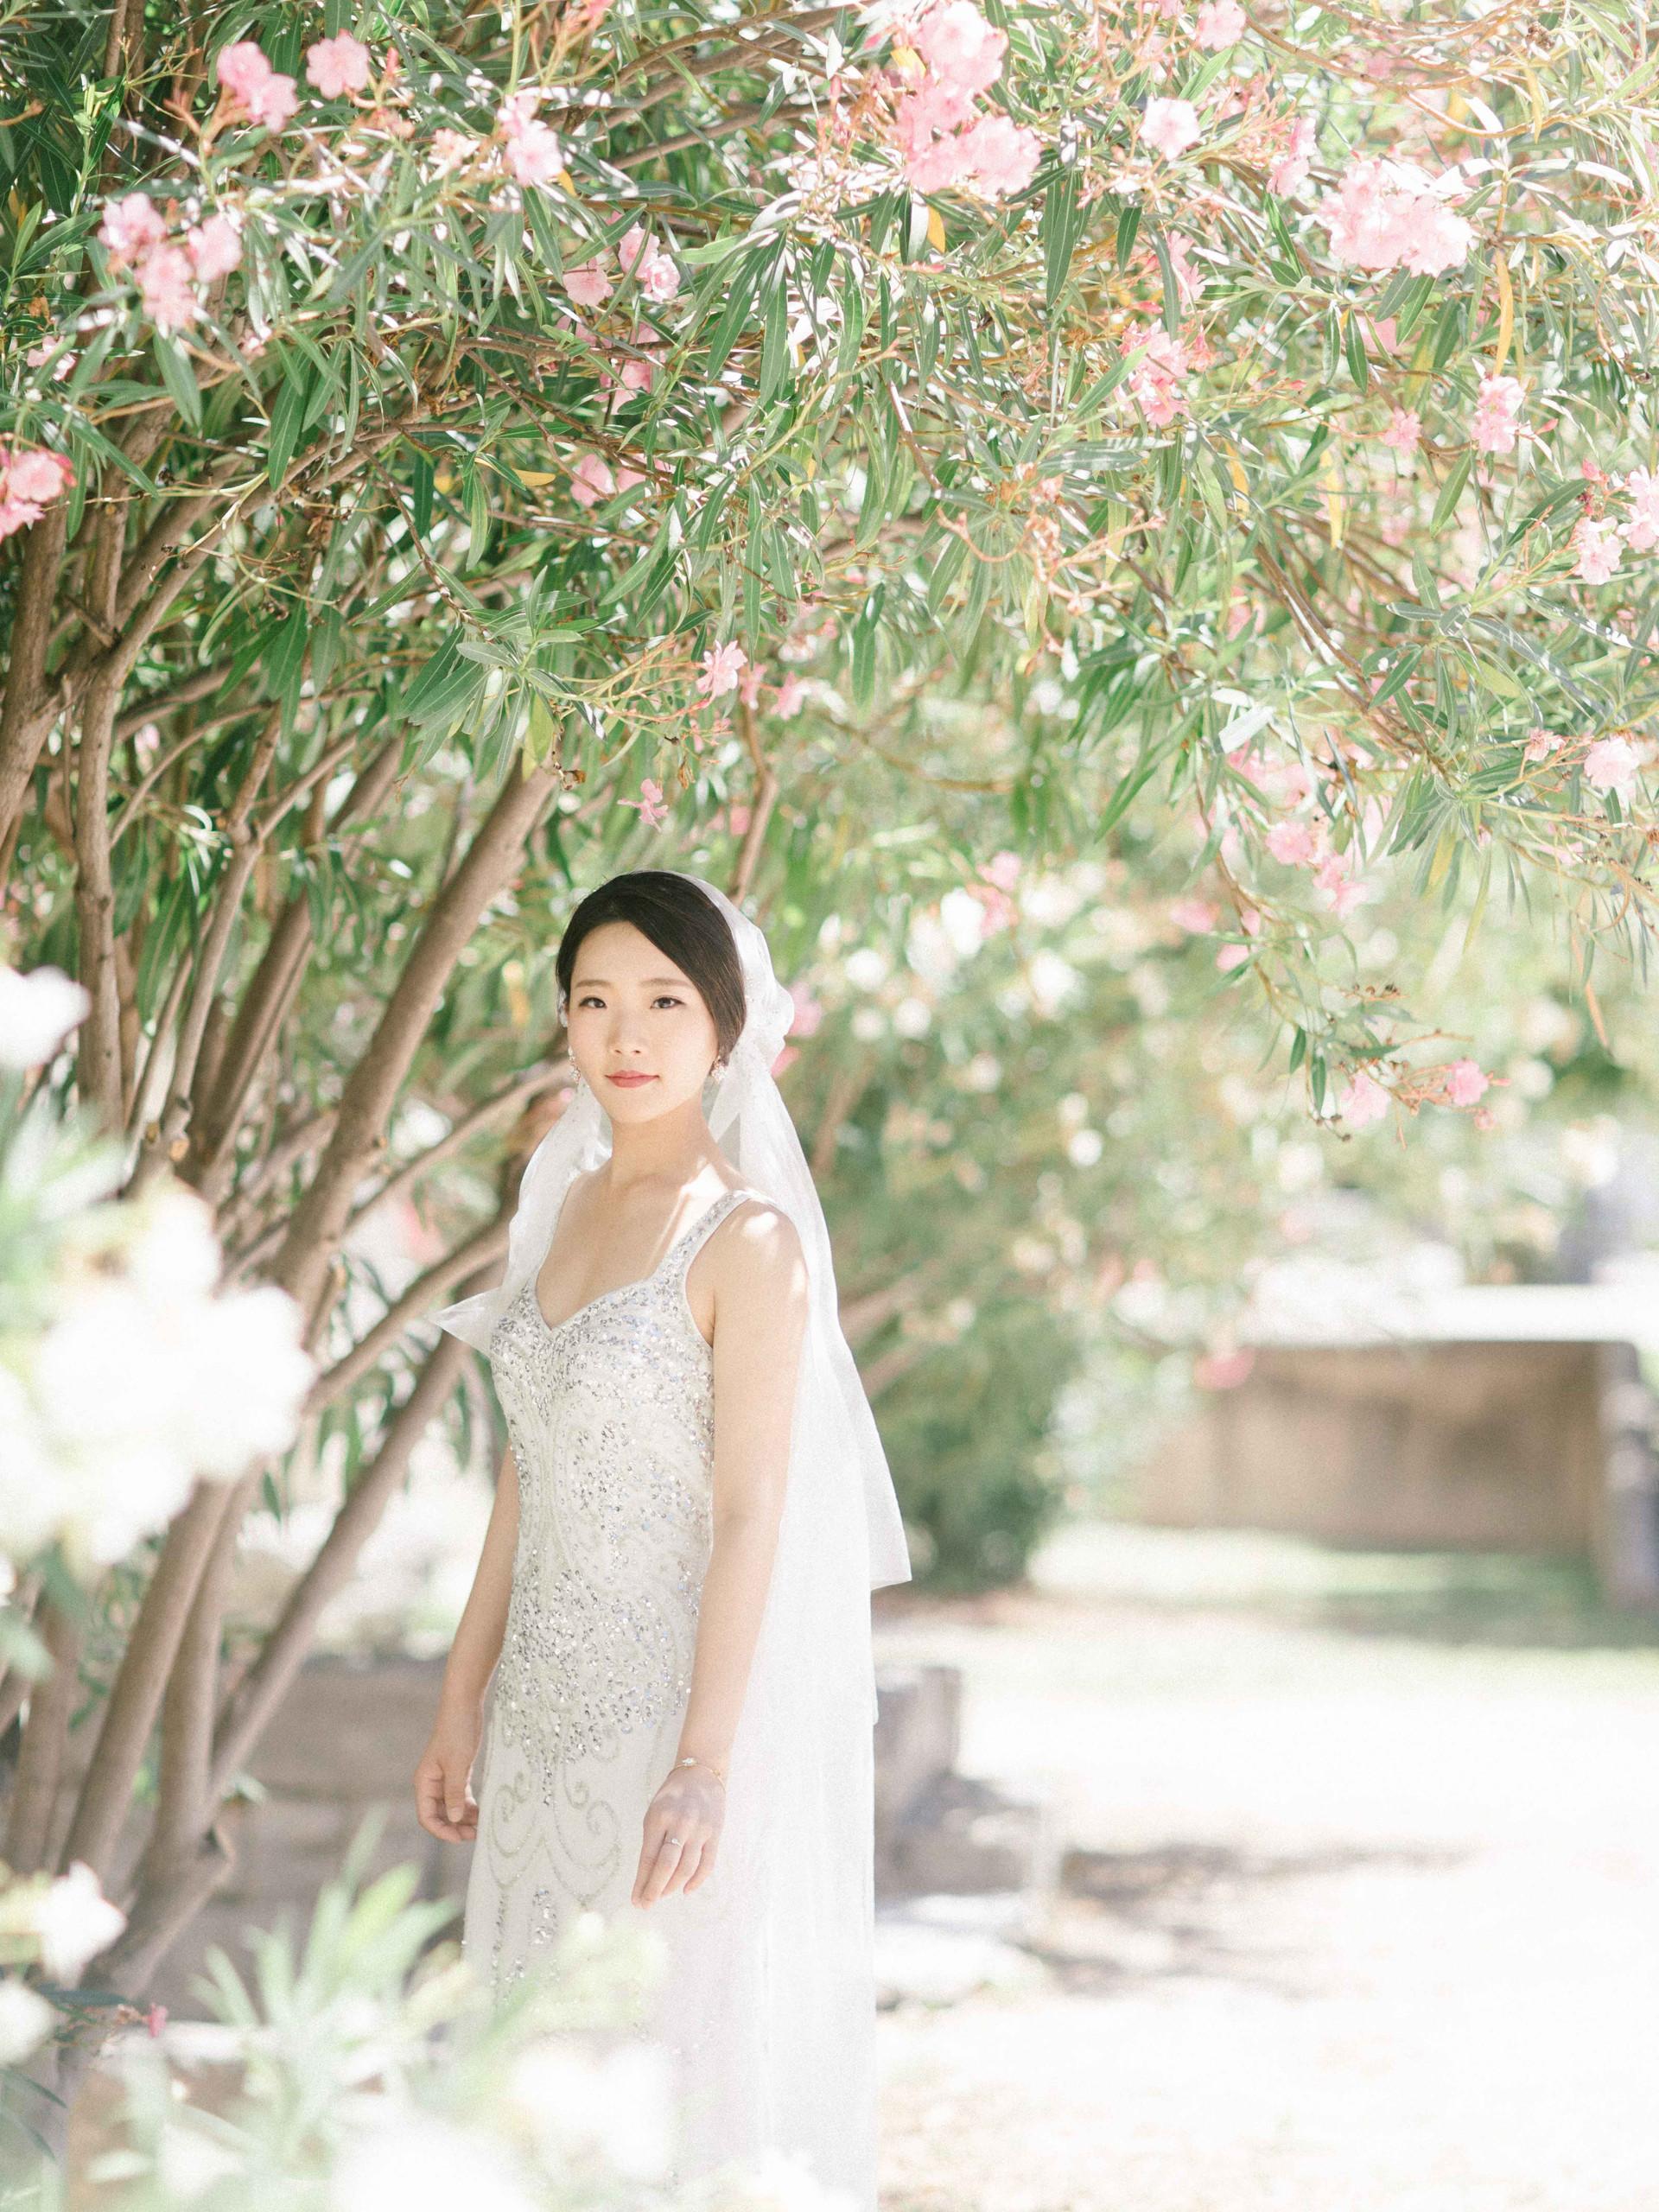 Lukas Chan Photo Lab - Ivy Solo - website-56.jpg